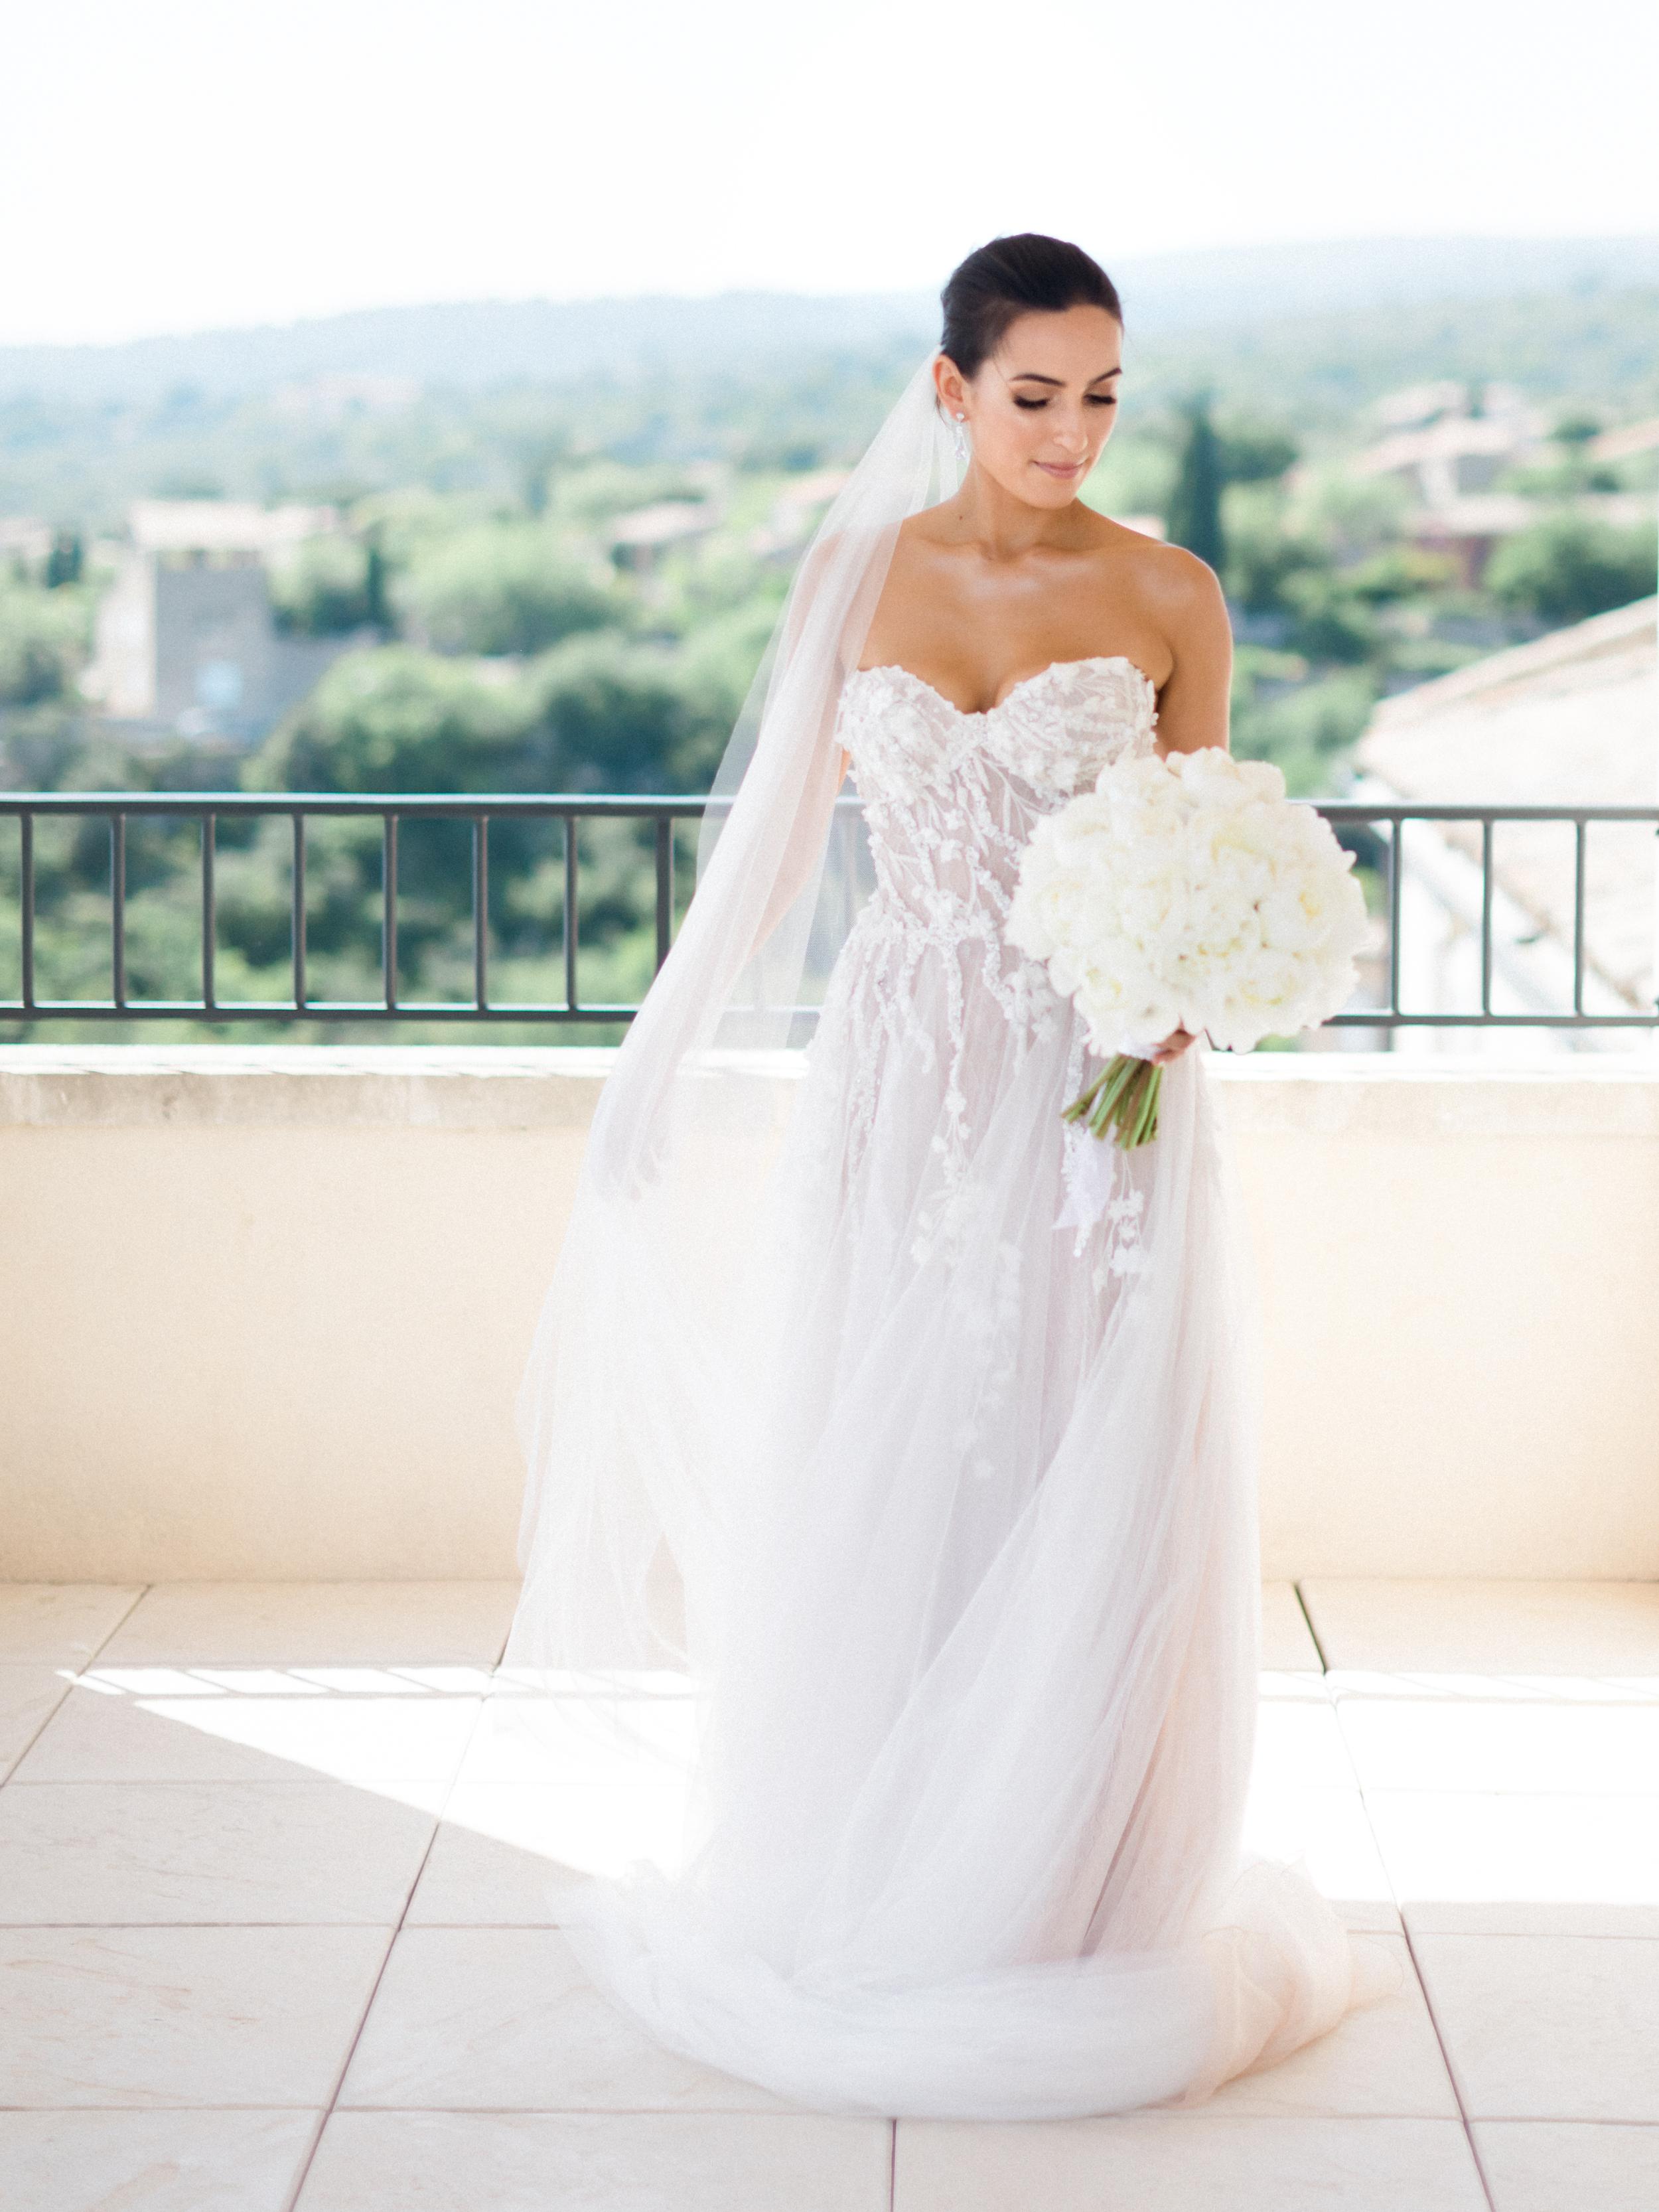 bastide_de_gordes_provence_wedding_(c)_rory-wylie-19.jpg